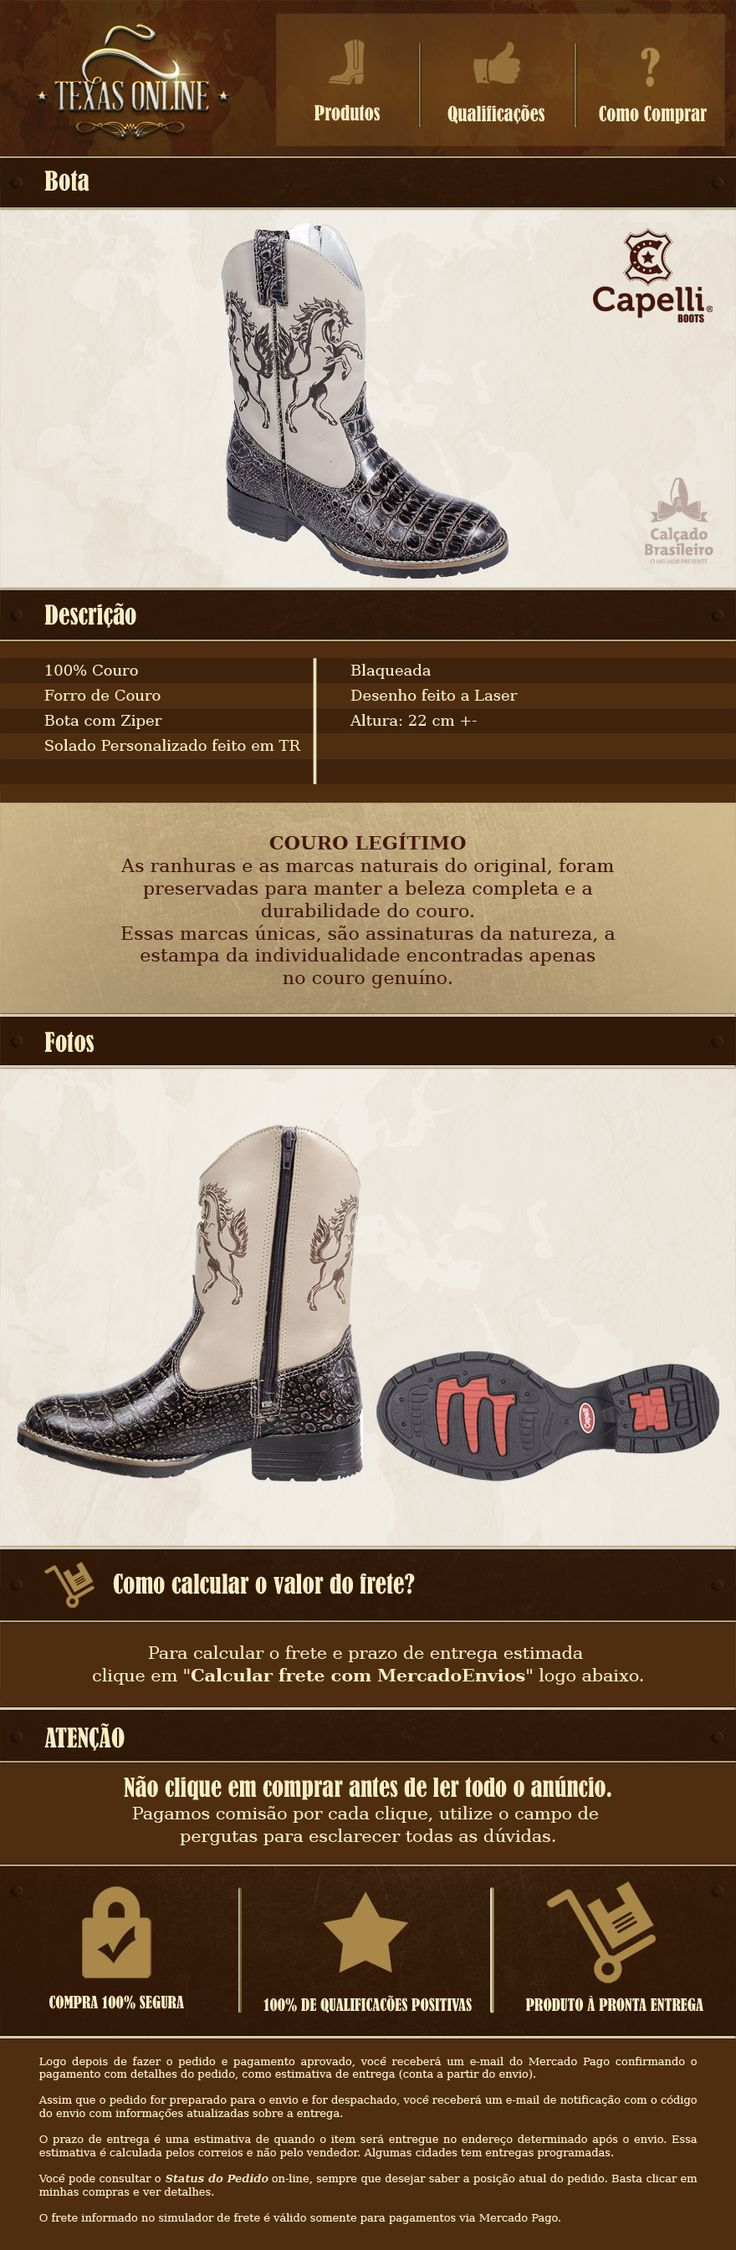 Bota Infantil Country / Rodeo / Western / Texana Capelli - R$ 179,90 no MercadoLivre